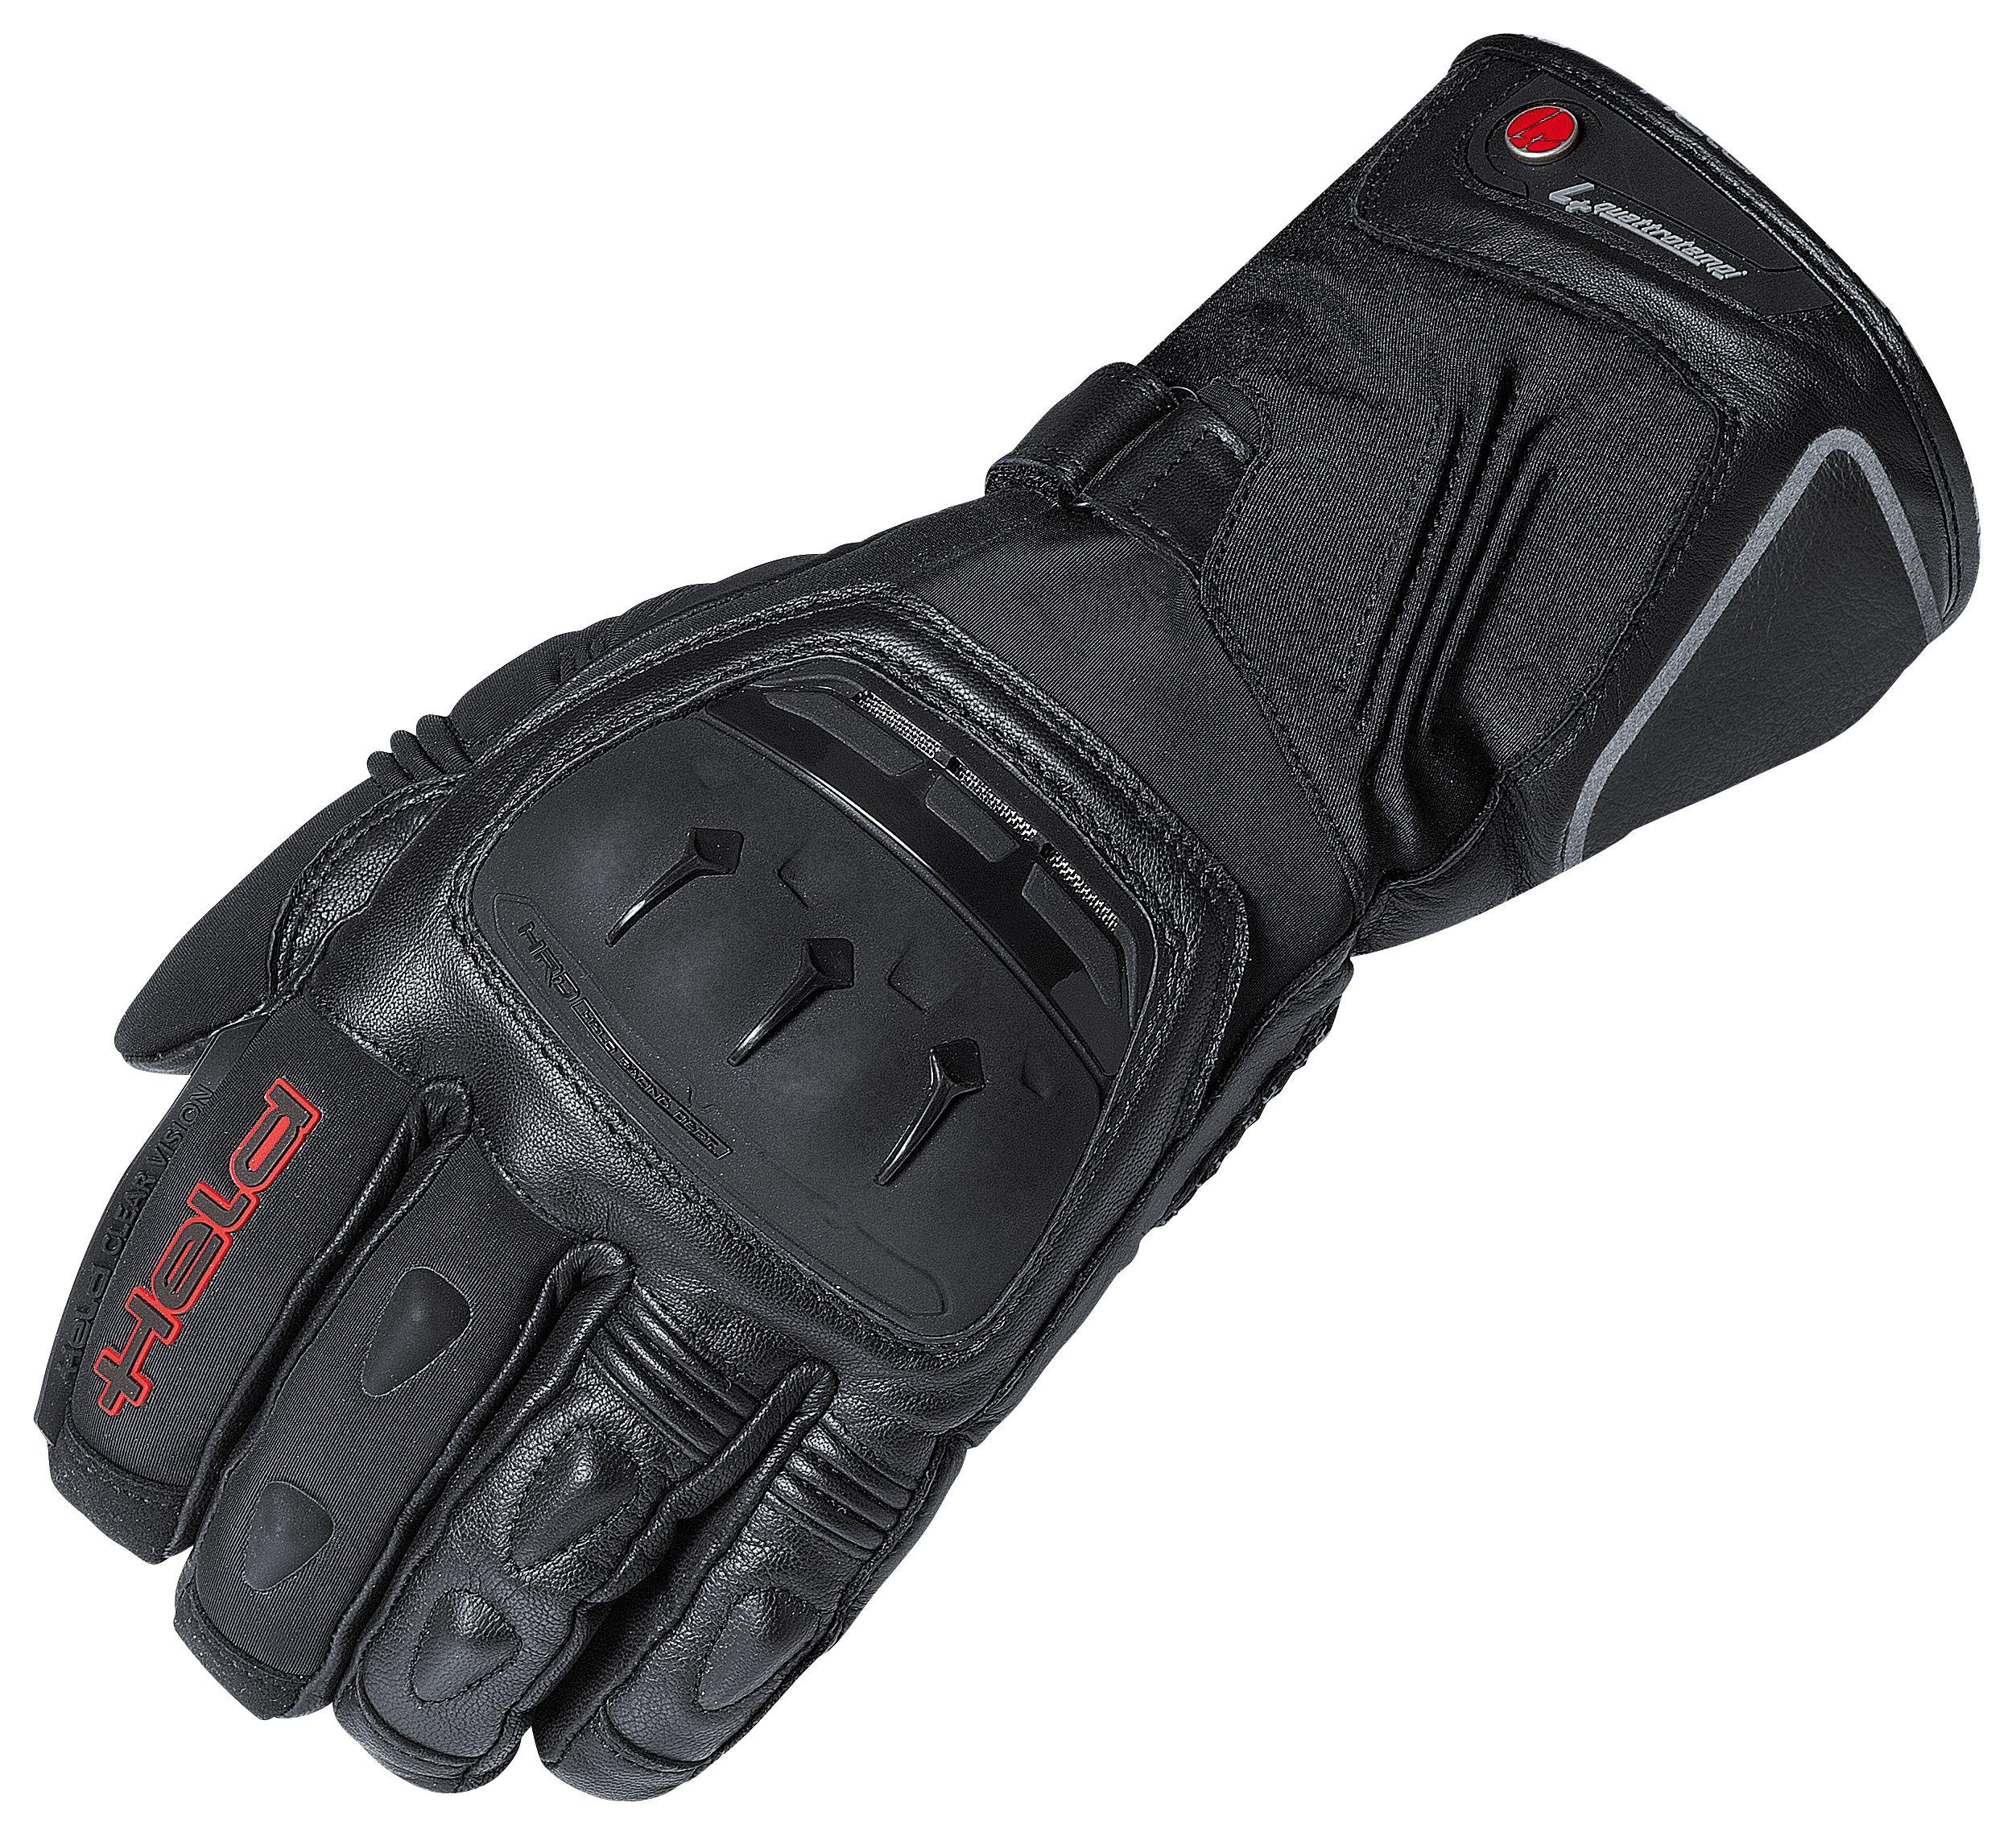 Motorcycle gloves cruiser - Motorcycle Gloves Cruiser 56